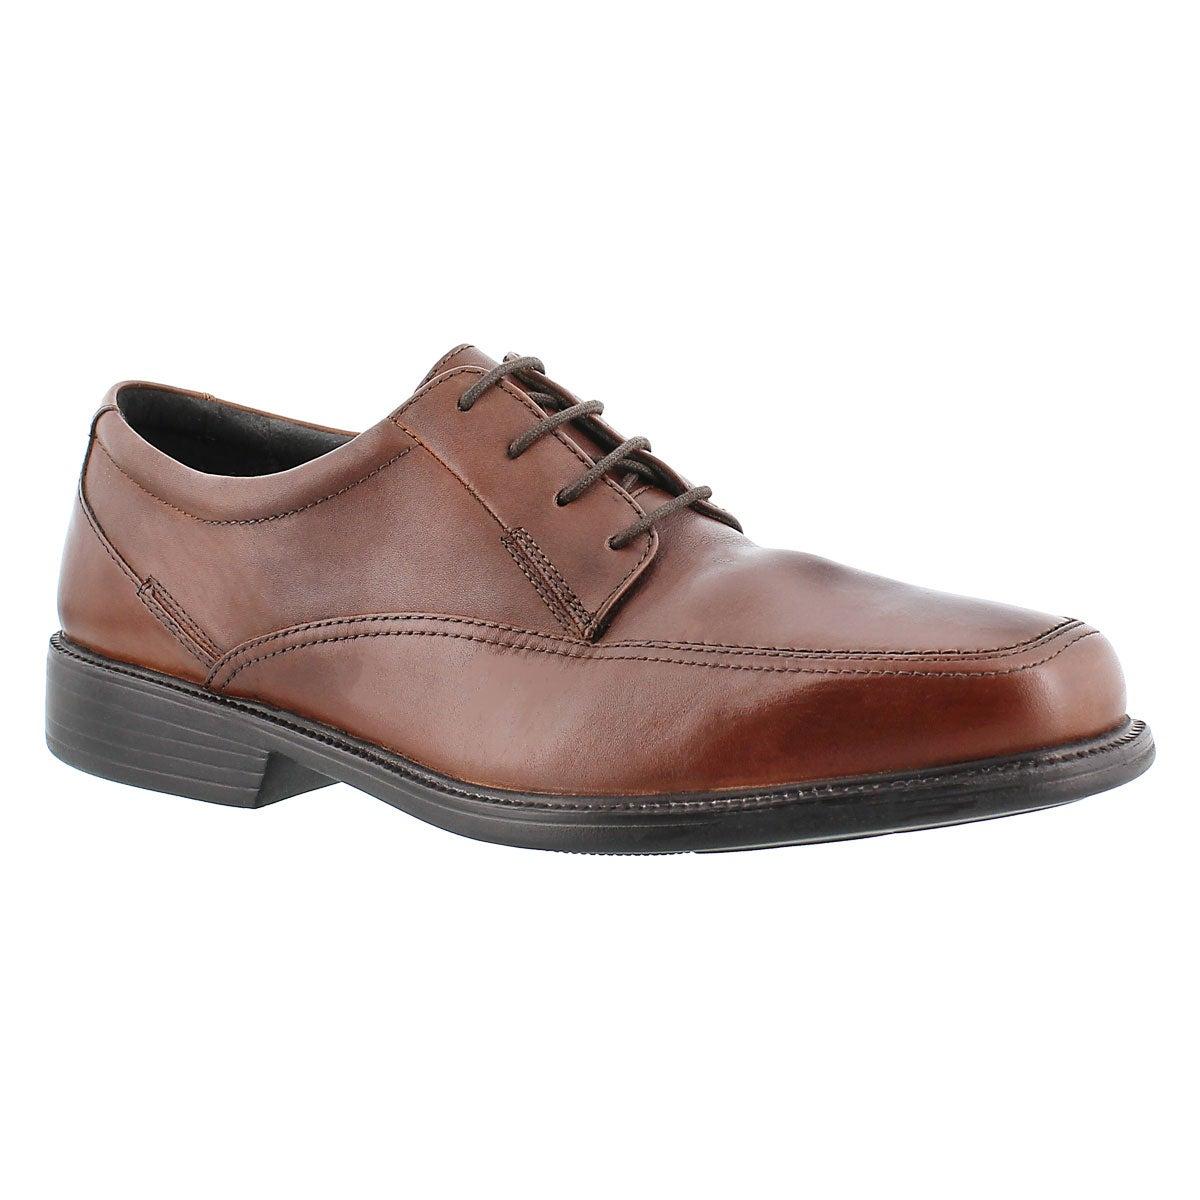 Men's IPSWITCH brown dress oxfords - Wide